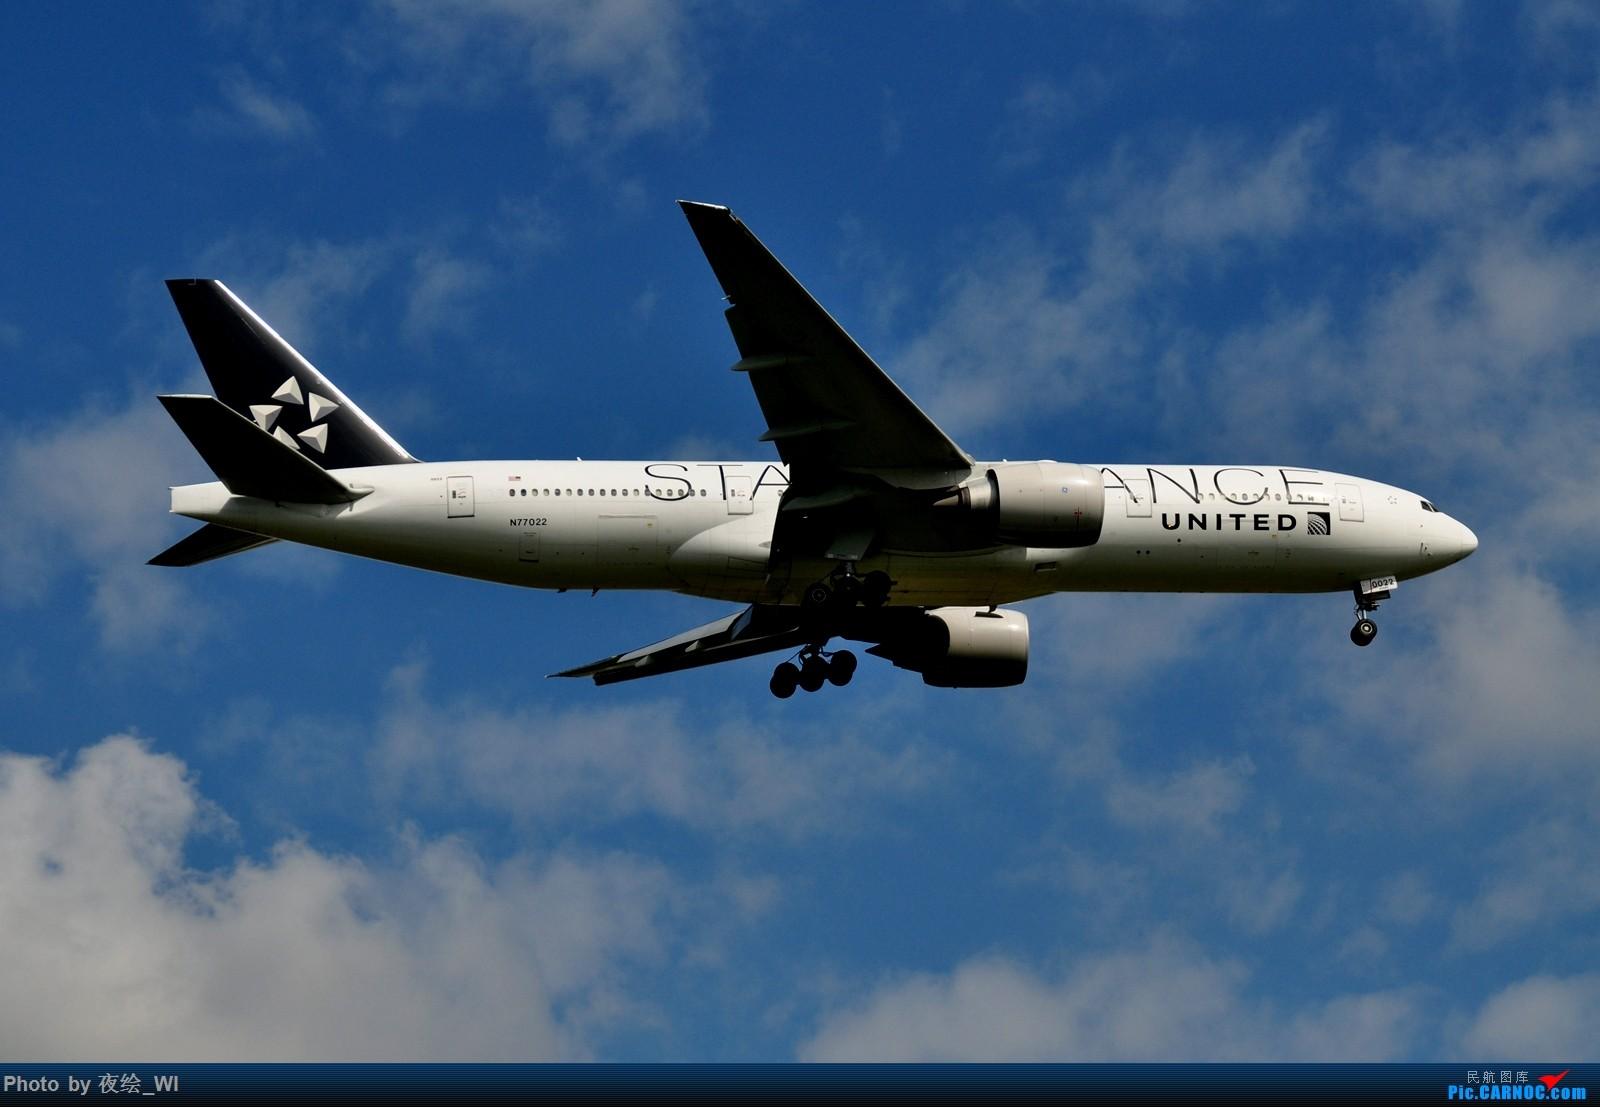 Re:[原创]【PVG】不只守着NKG,国庆疯狂拍机之浦东行,天空美得简直不像话! BOEING 777-200ER N77022 中国上海浦东国际机场